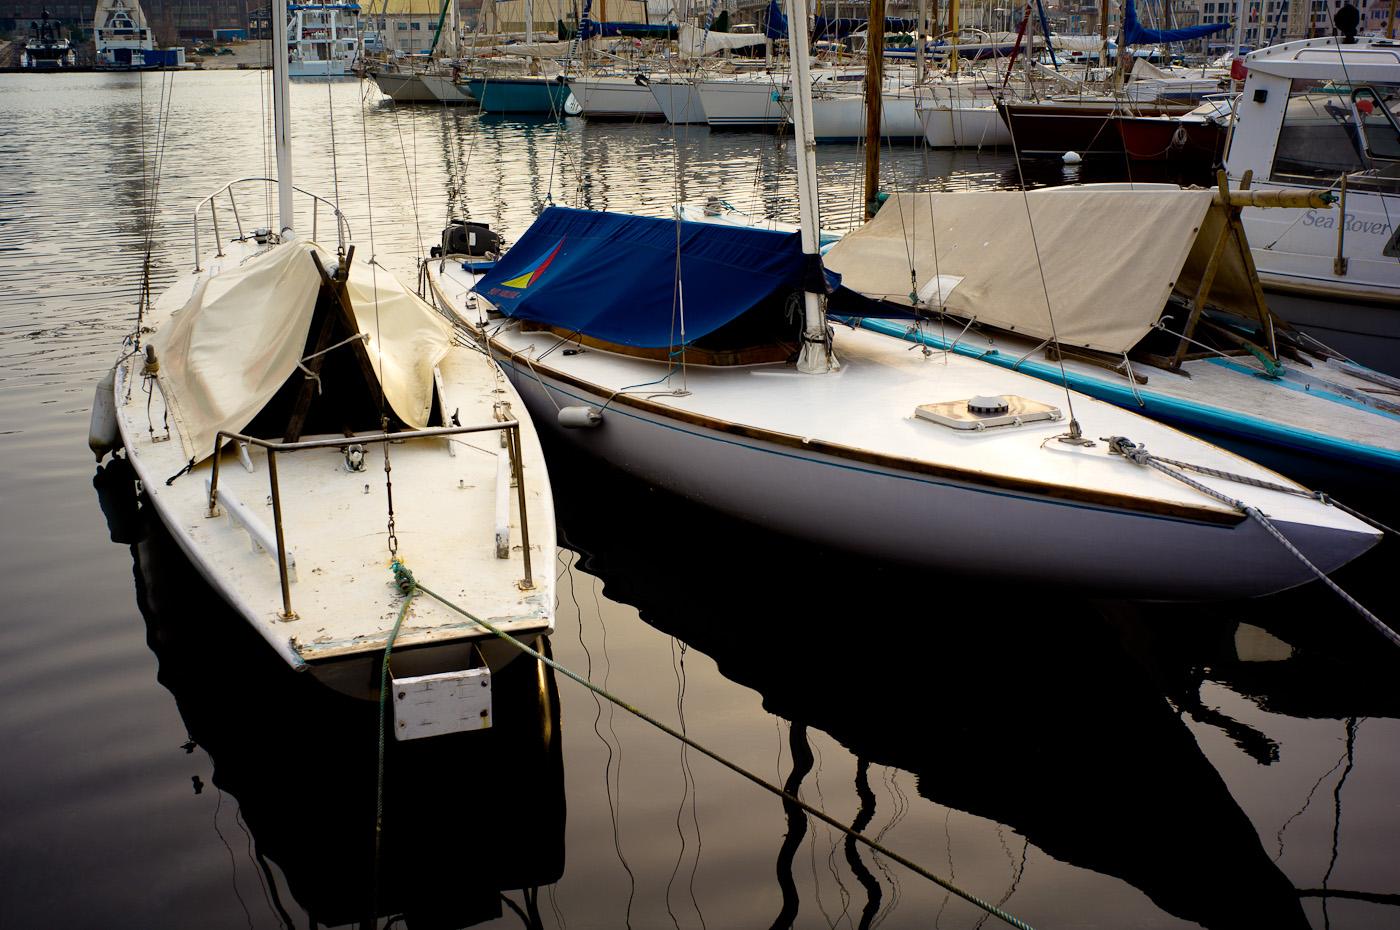 Two dragon boats in La Ciotat harbour